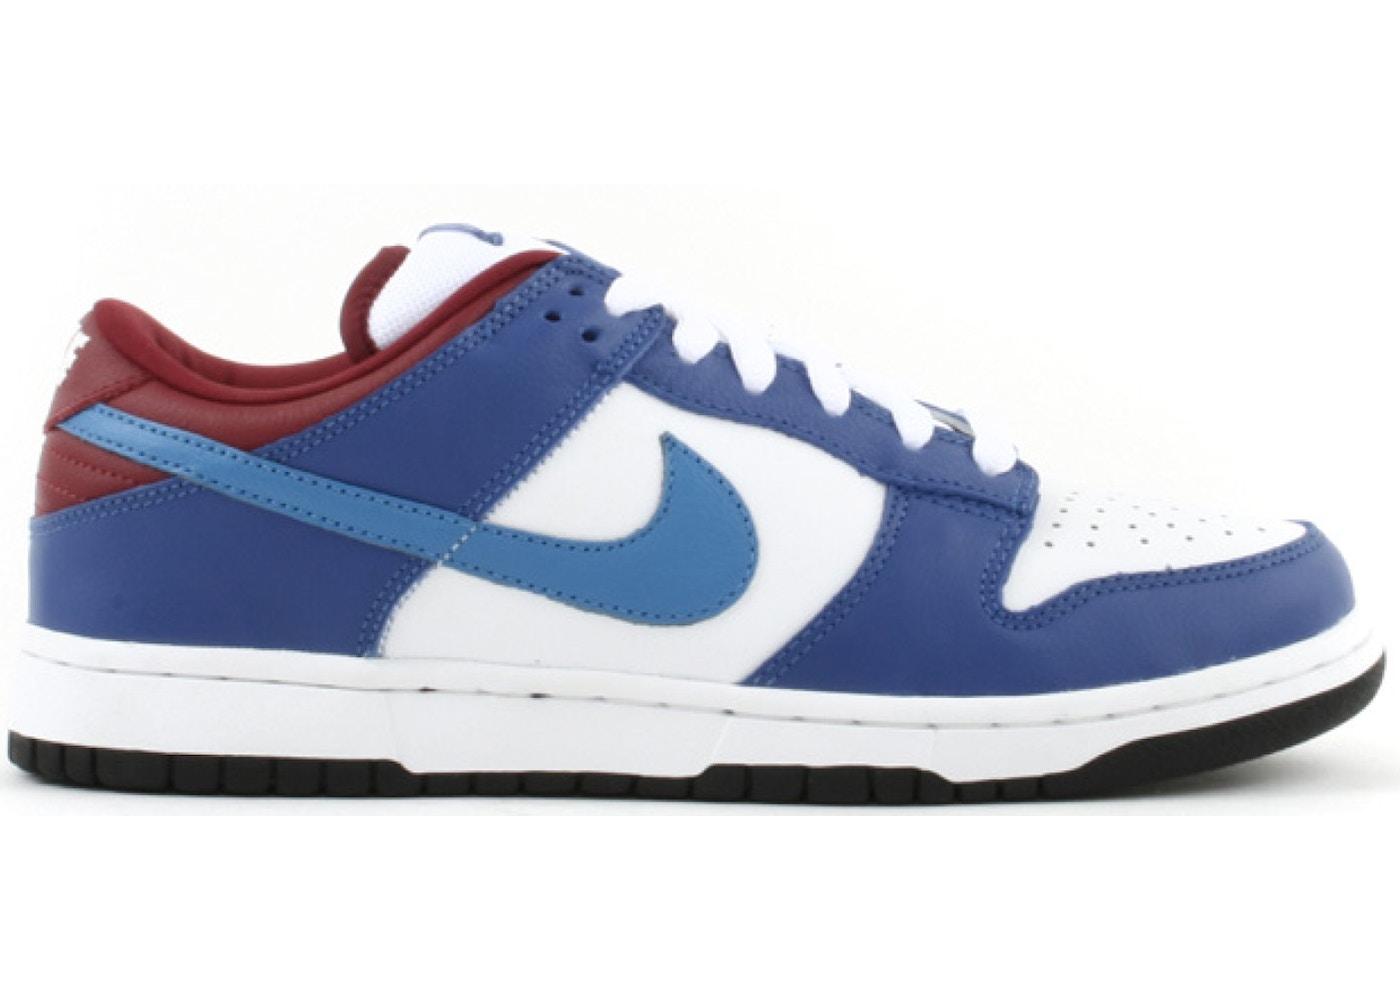 a0cd4127 Nike SB Dunk Low Neptune - 304292-144